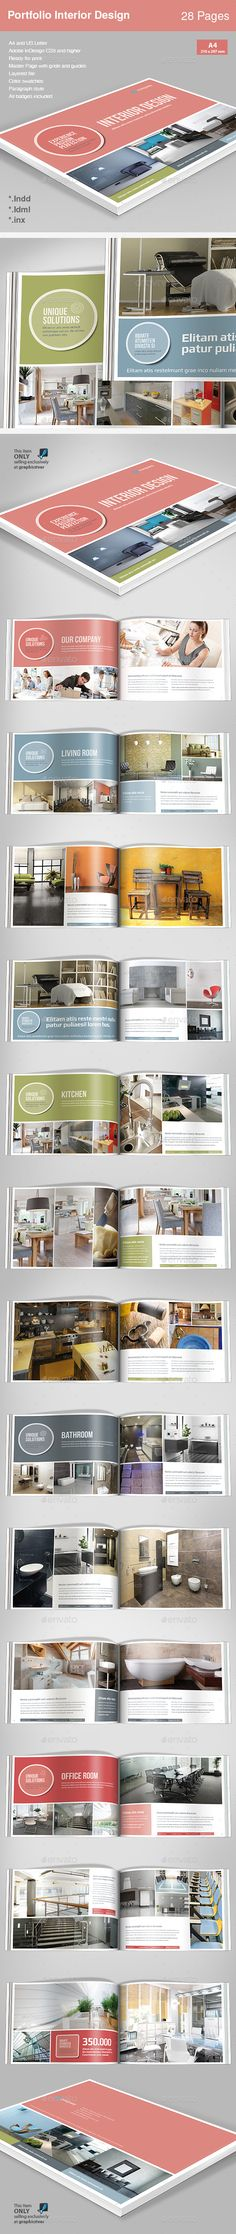 Cool Minimal Mint Brochure Download here http\/\/googl\/nBaZvw - interior design brochure template